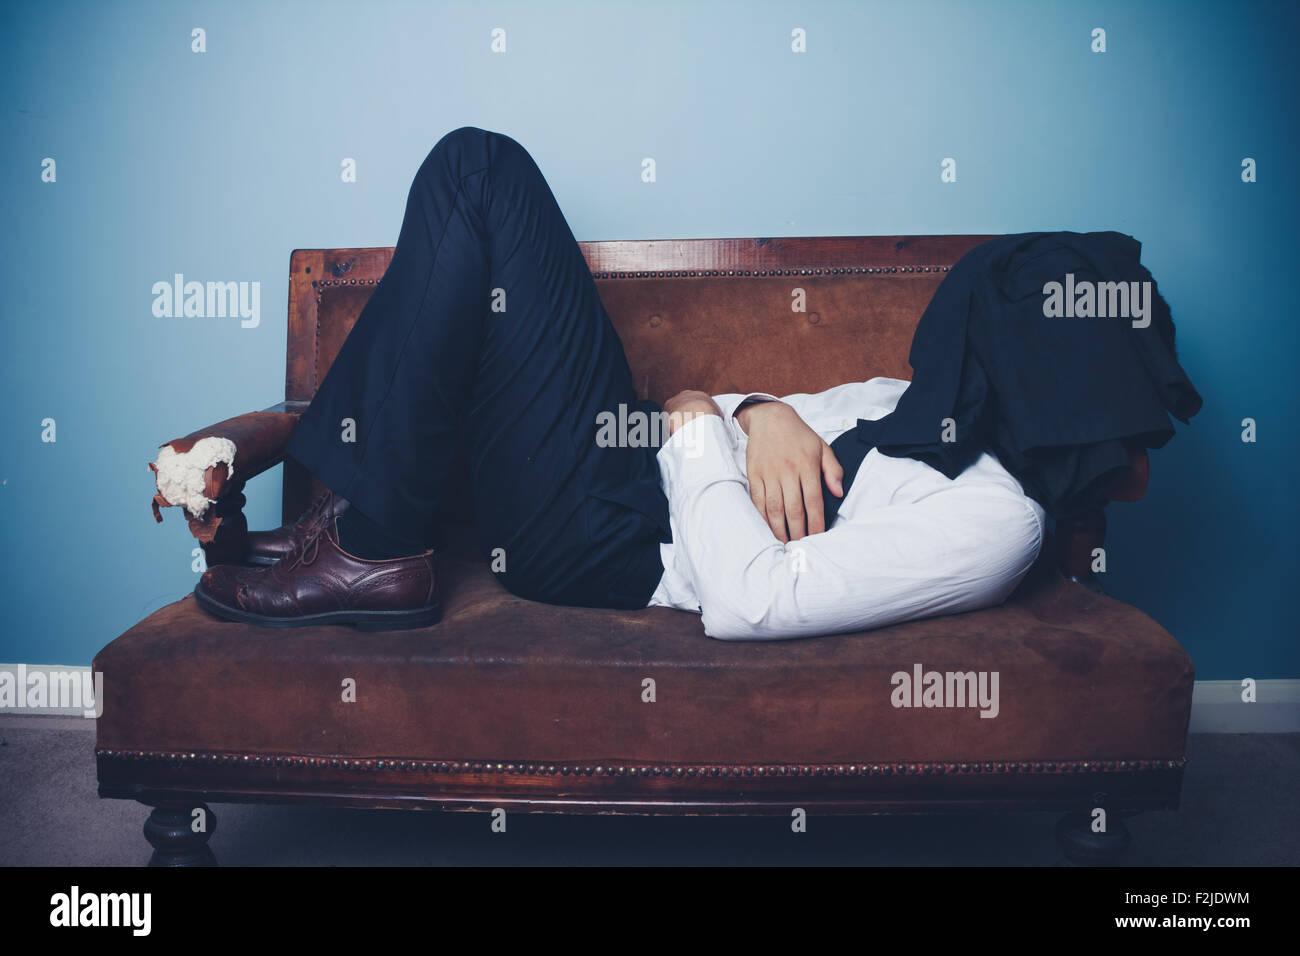 Young businessman on sofa sleeping - Stock Image